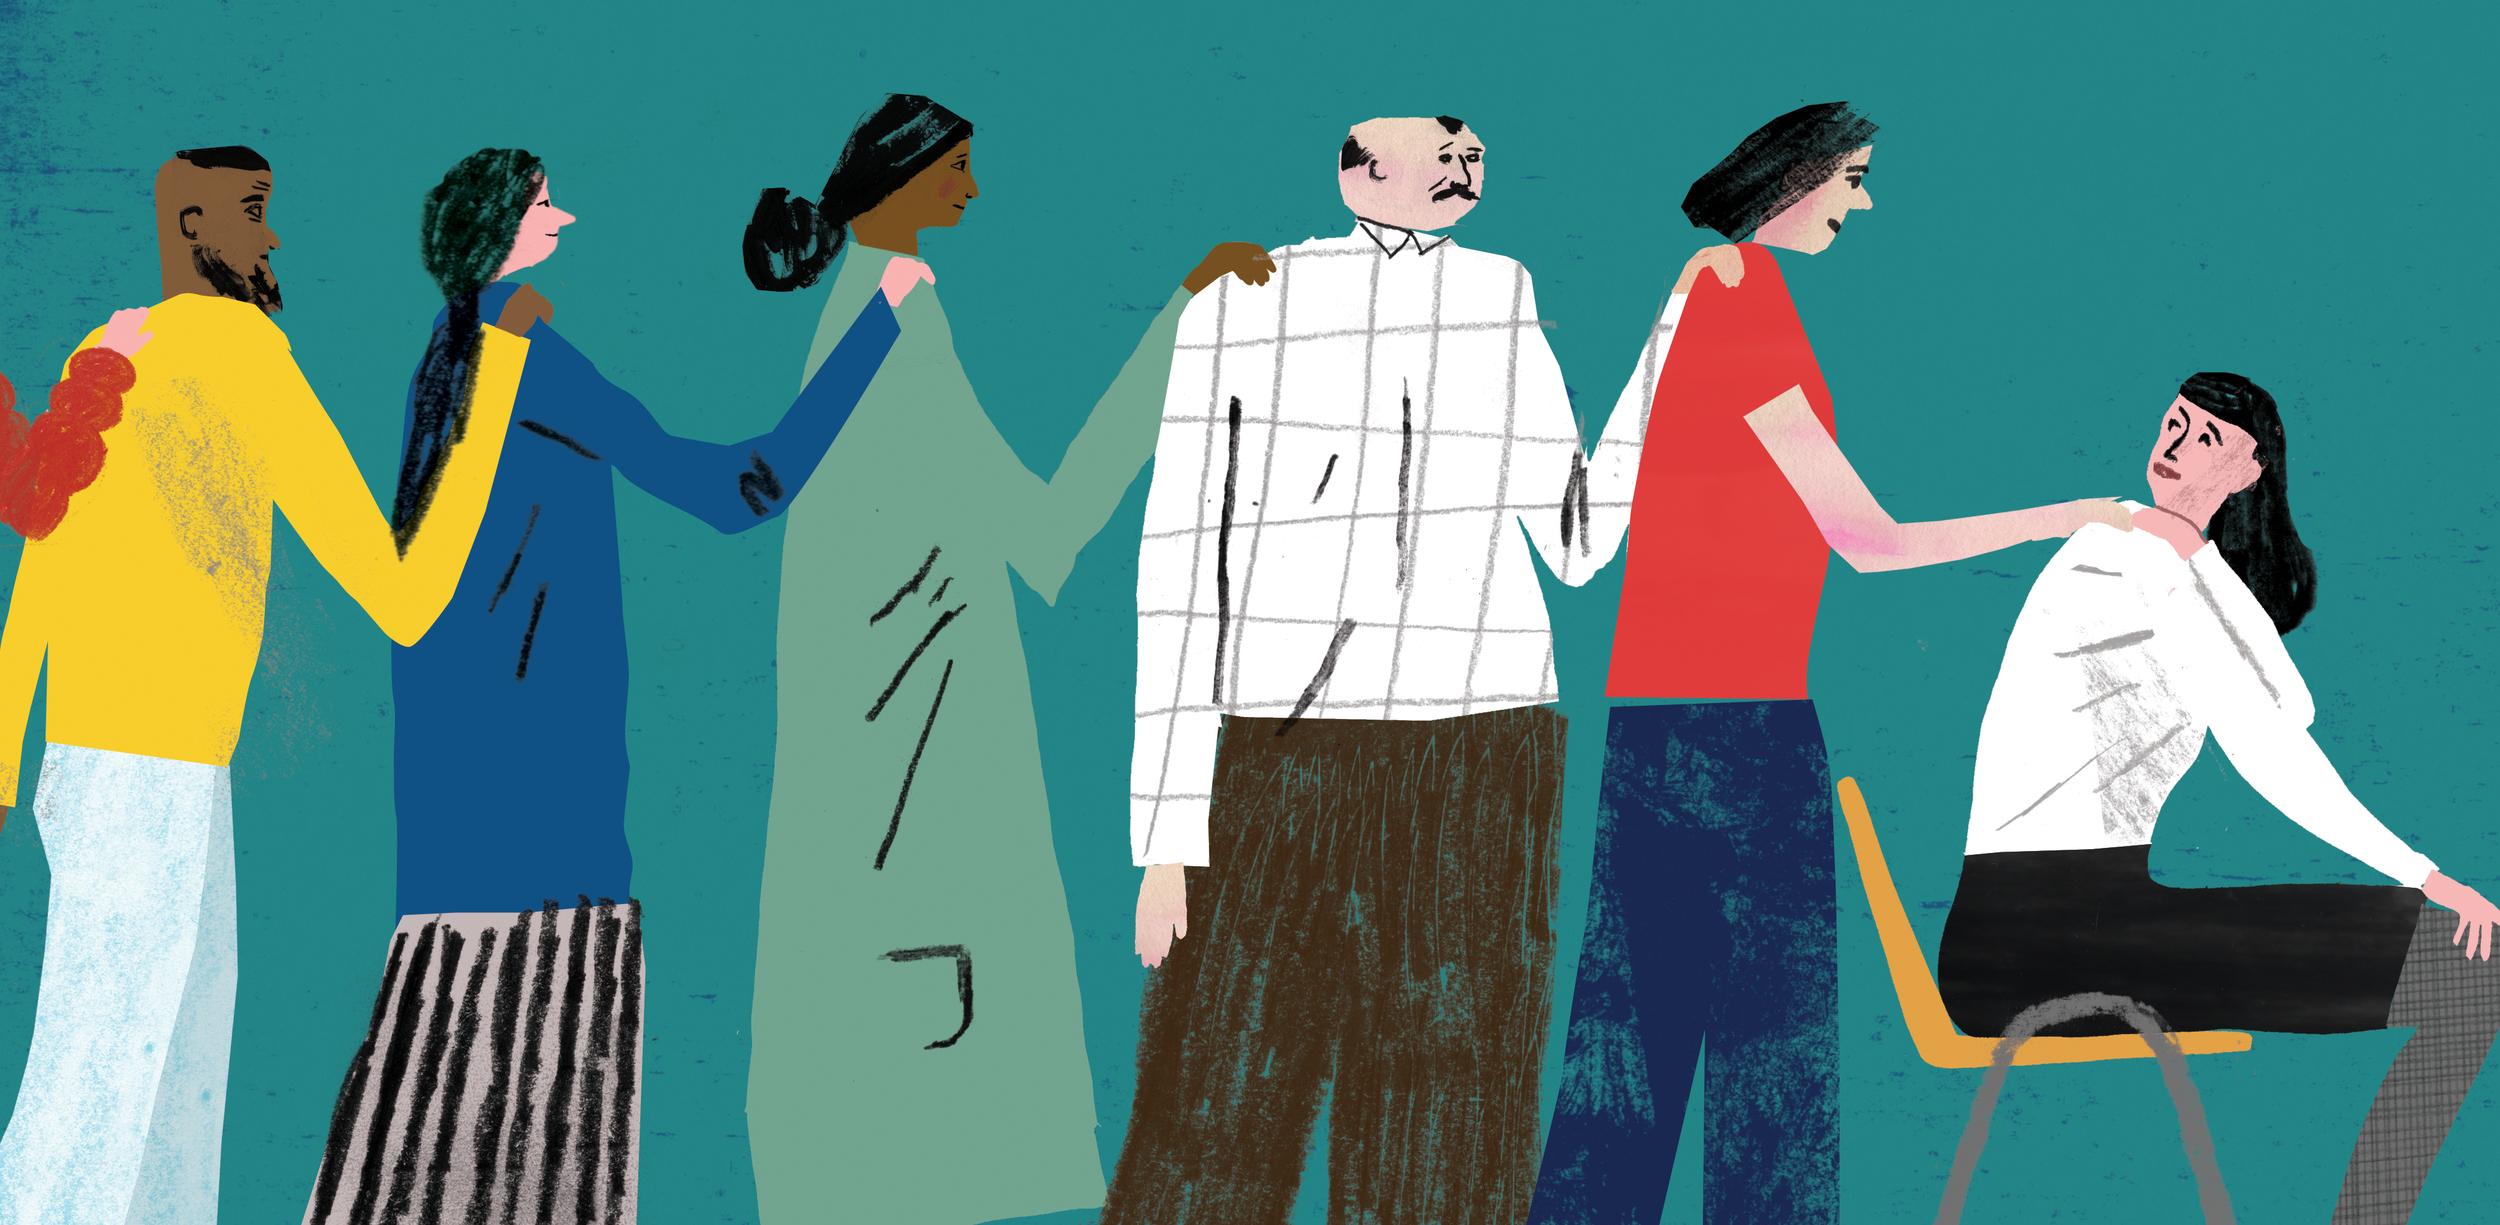 I became a nurse at the same hospital I had my cancer treatment